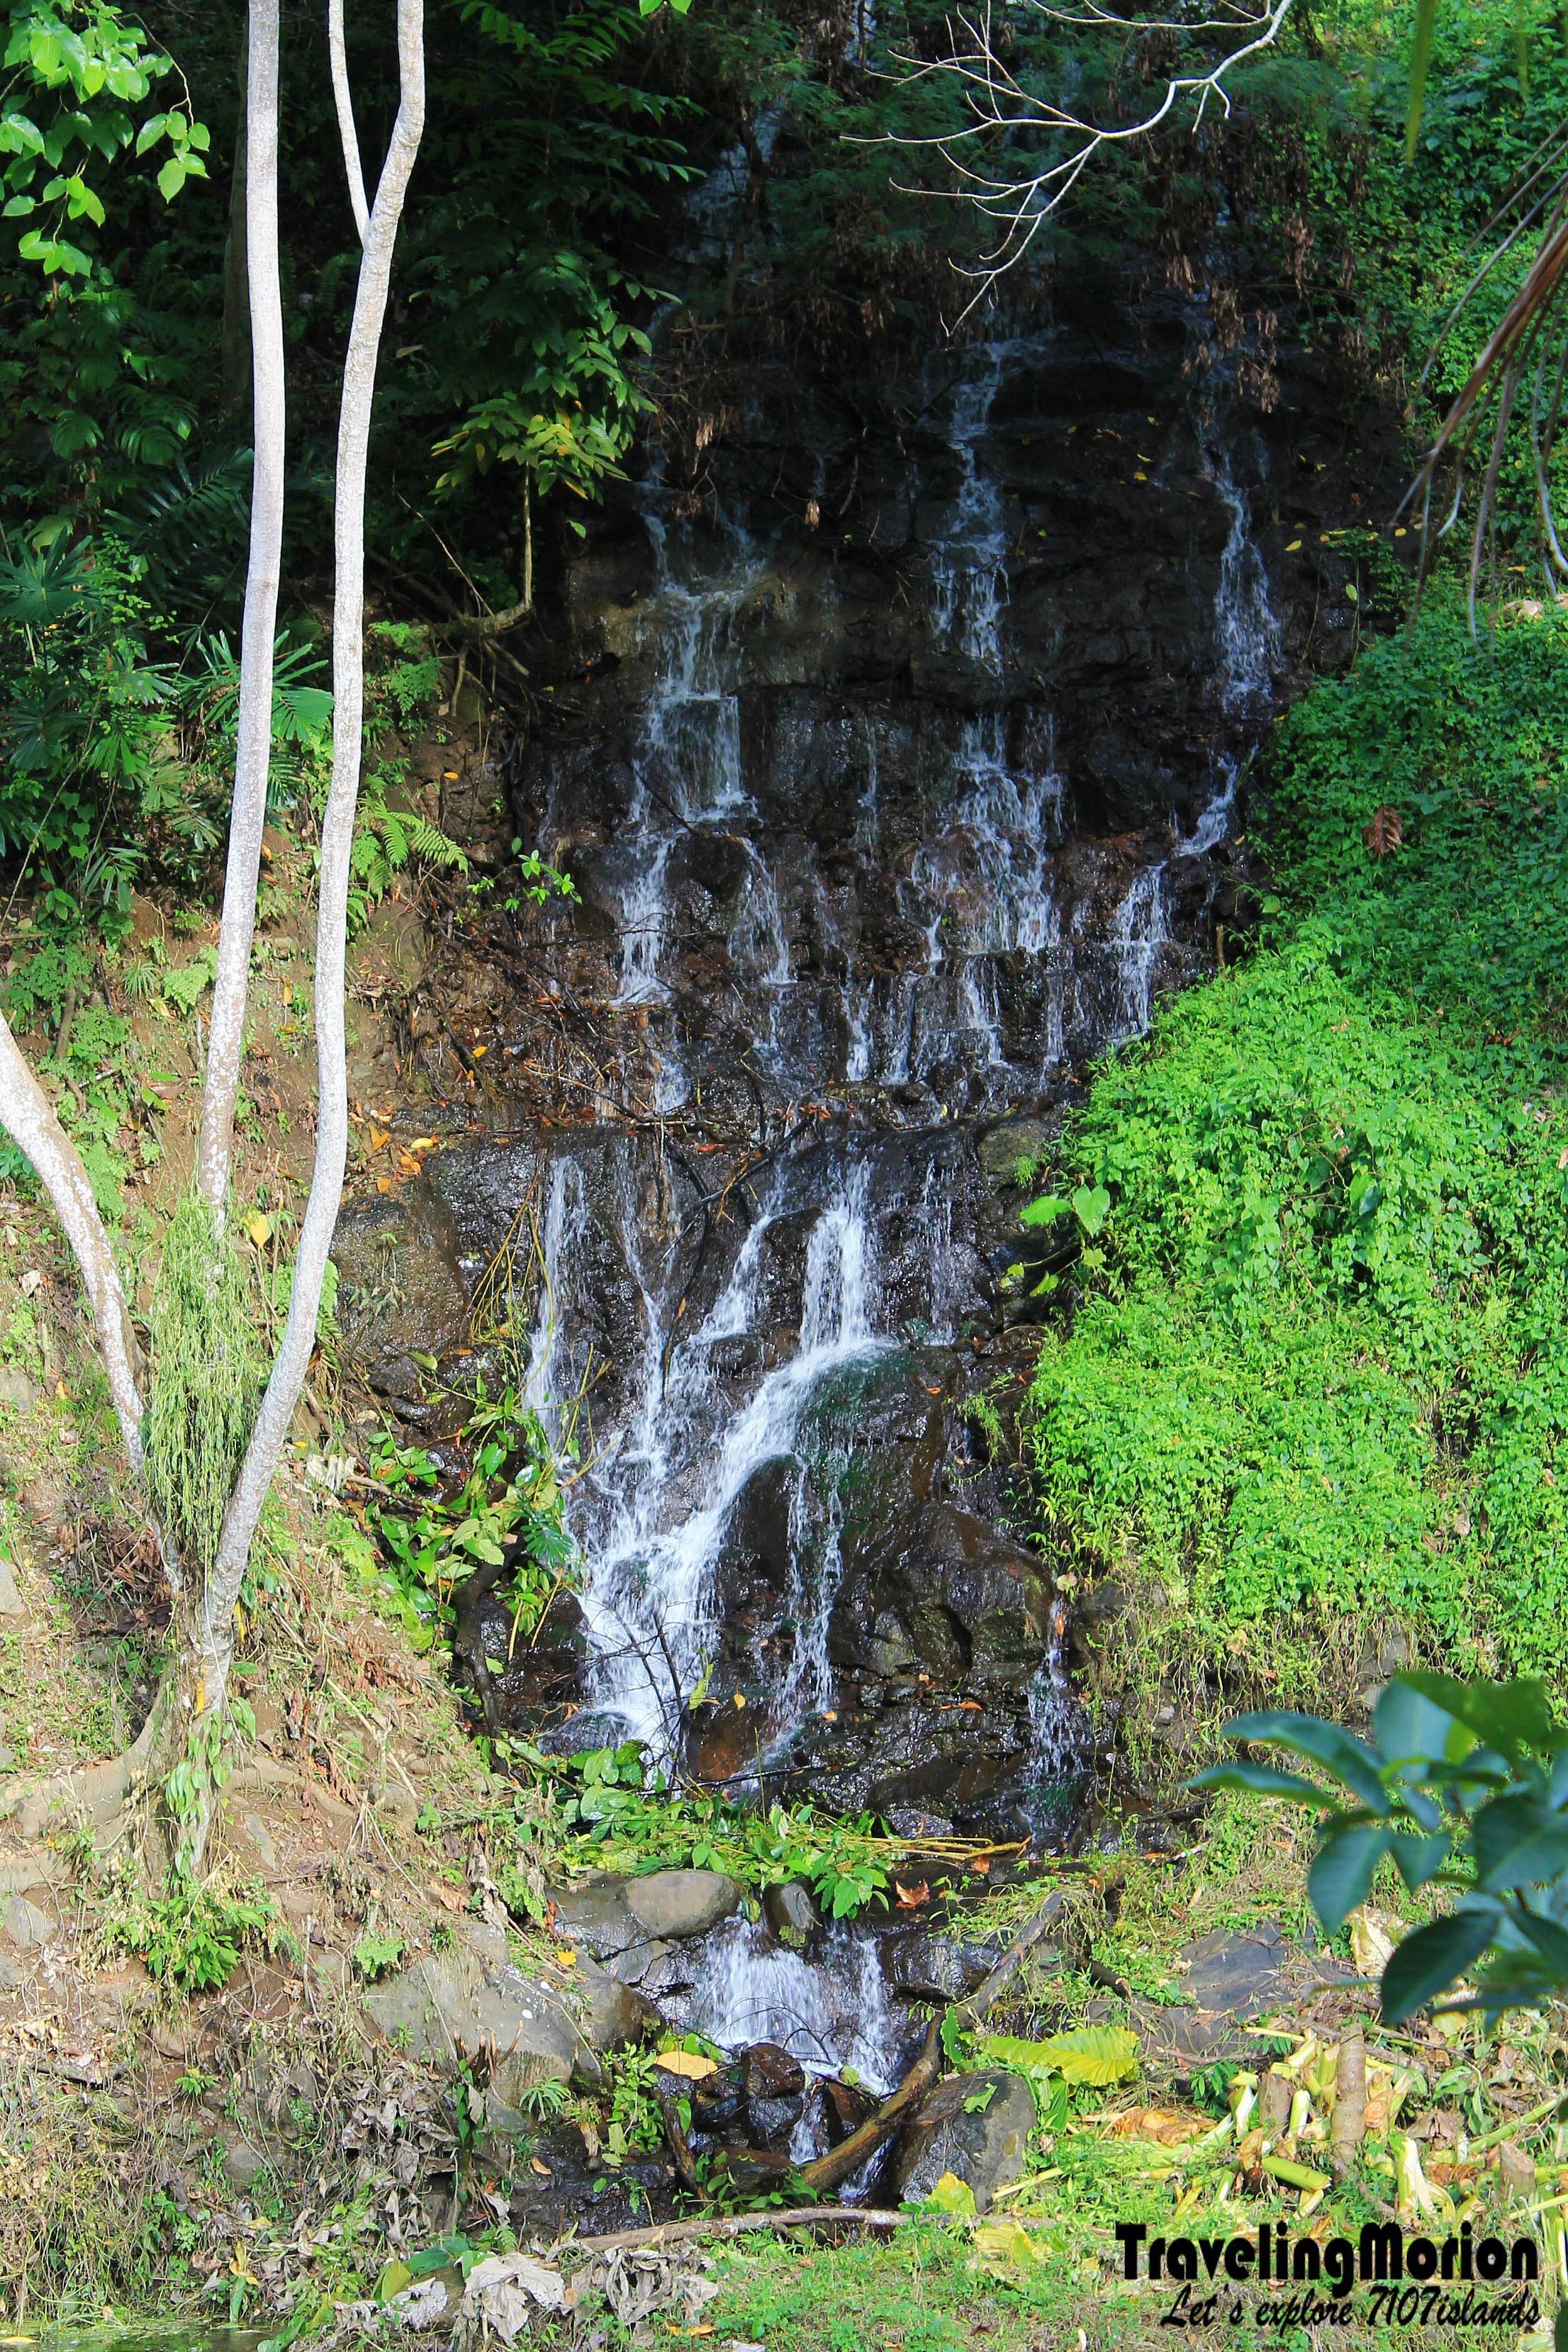 In Maria Cristina Falls and Nature Park